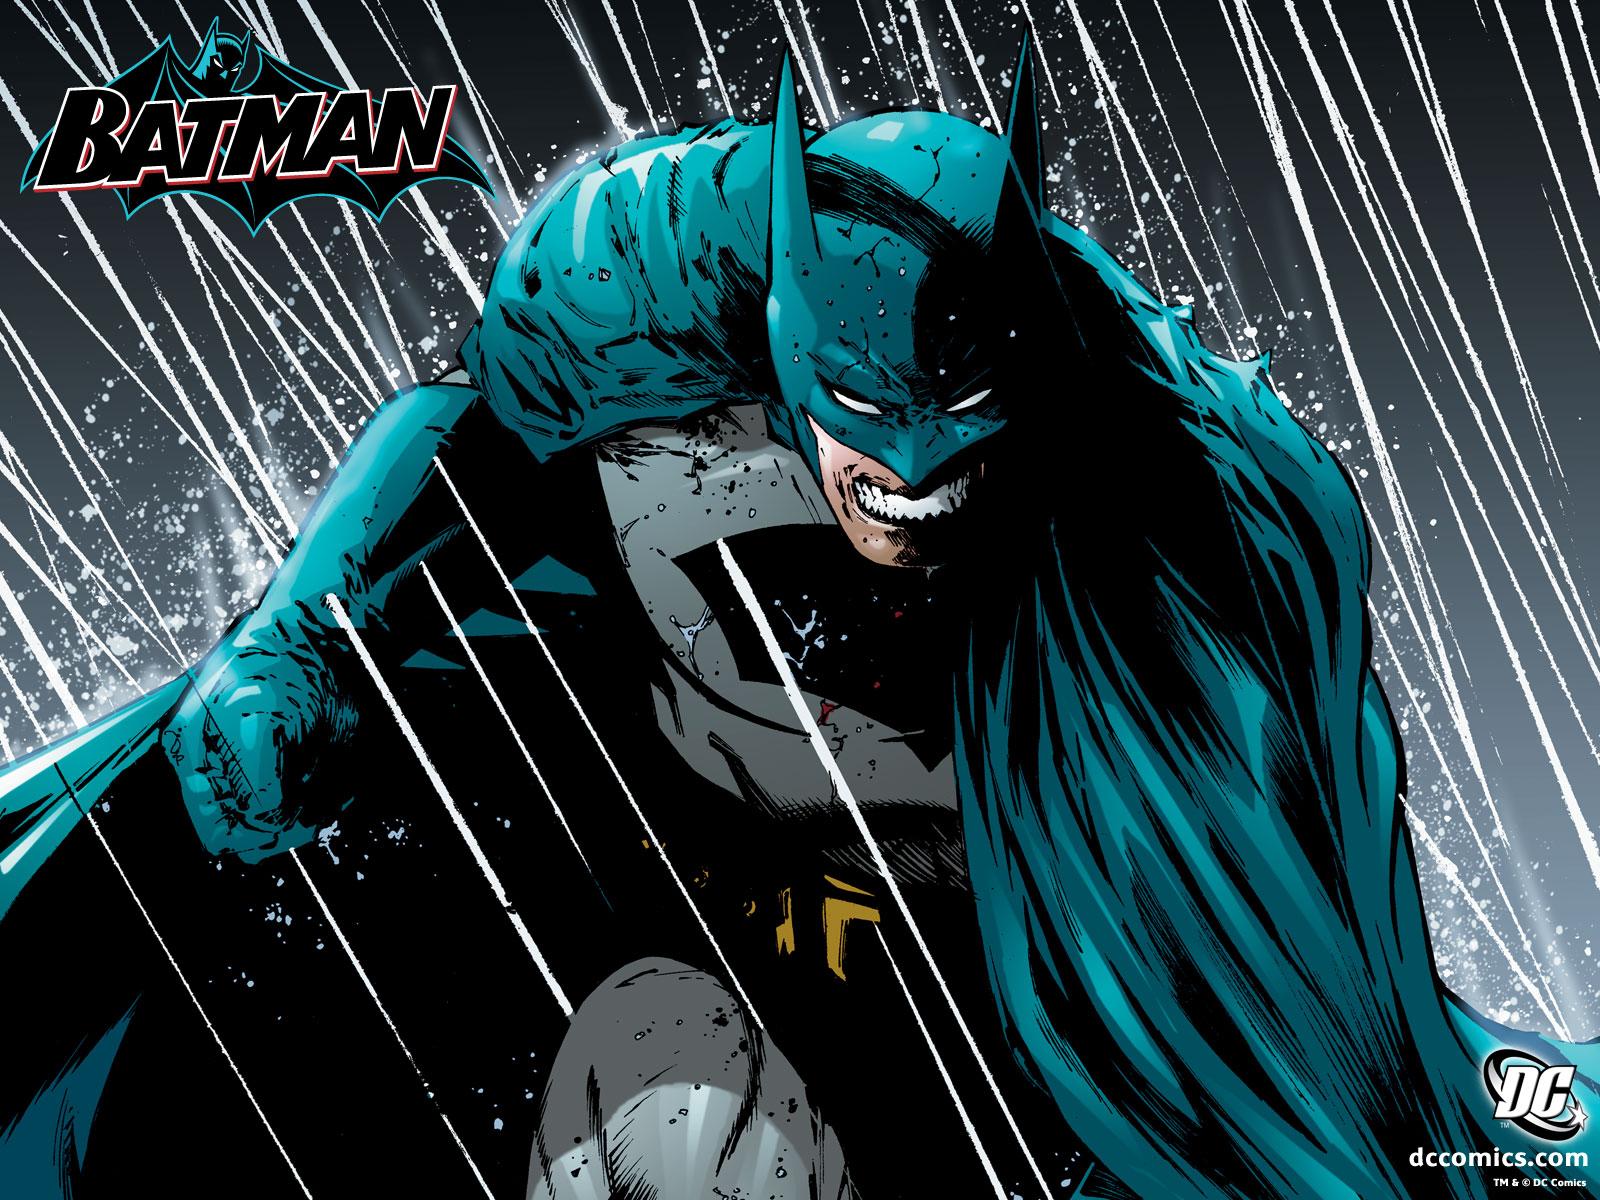 Rain   Superhero Games Wallpaper Image featuring Dc Universe Online 1600x1200